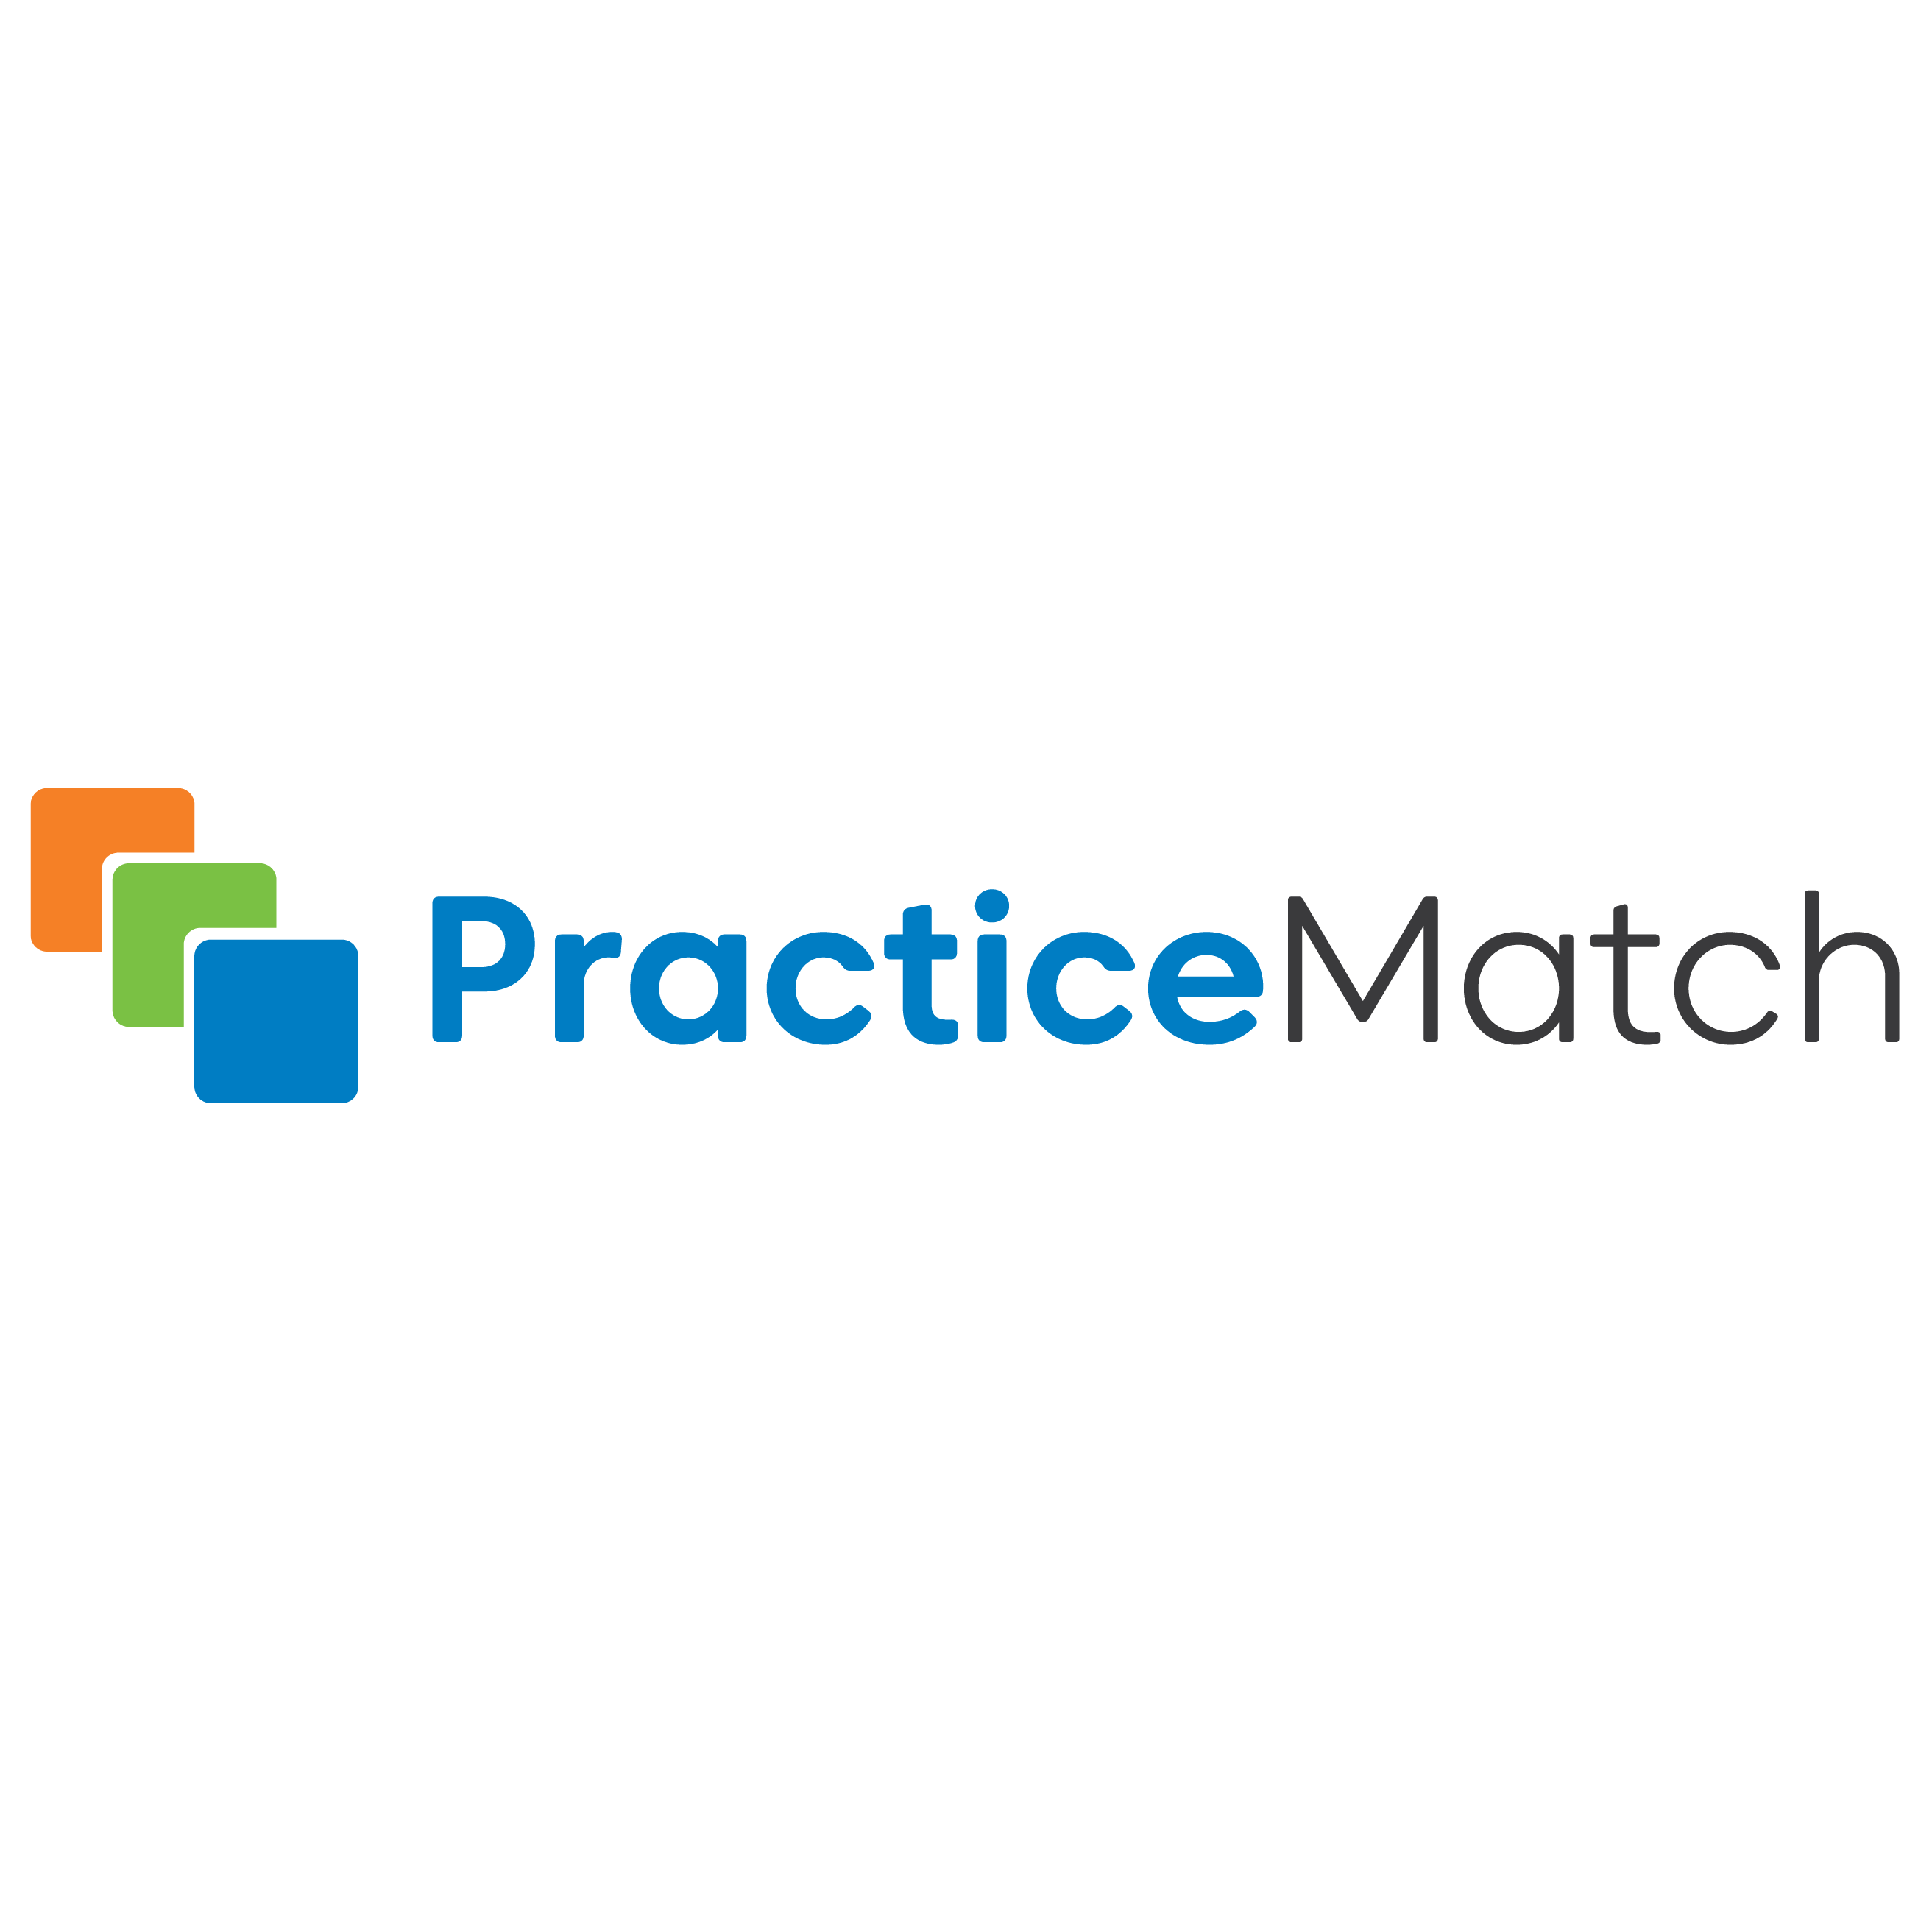 https://www.practicematch.com/